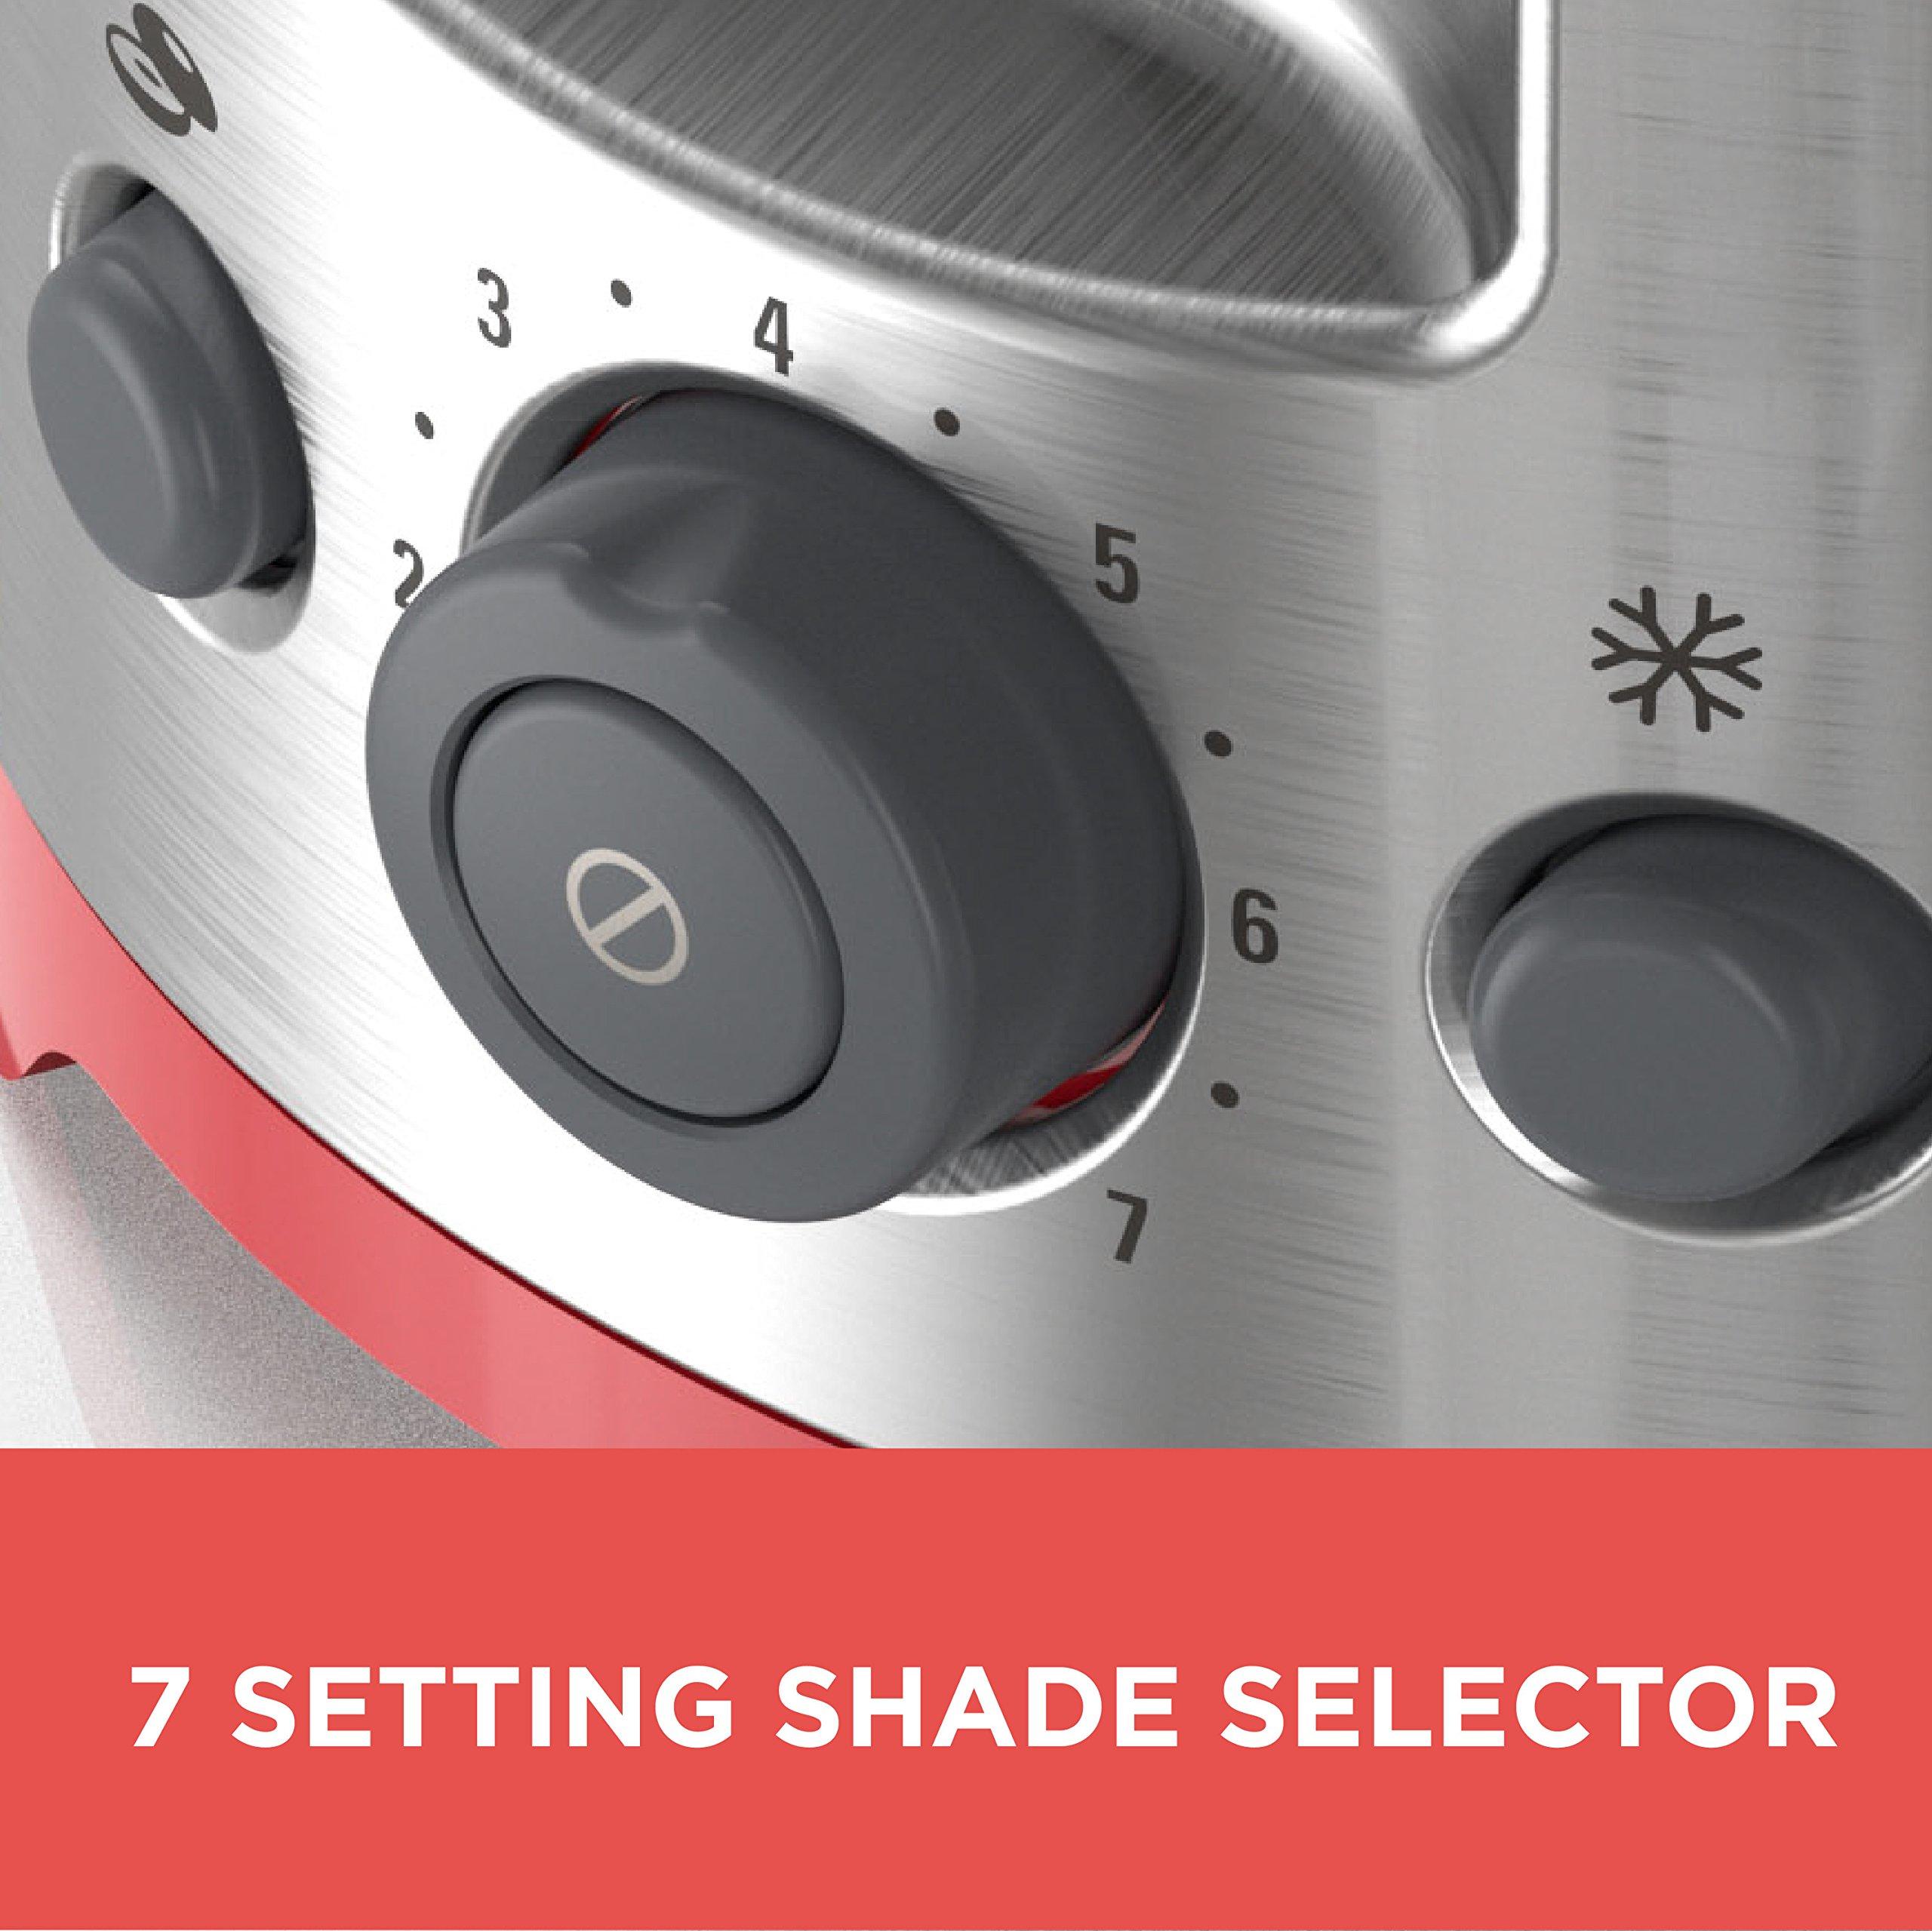 BLACK+DECKER 2-Slice Toaster, Red, TR1278RM by BLACK+DECKER (Image #6)